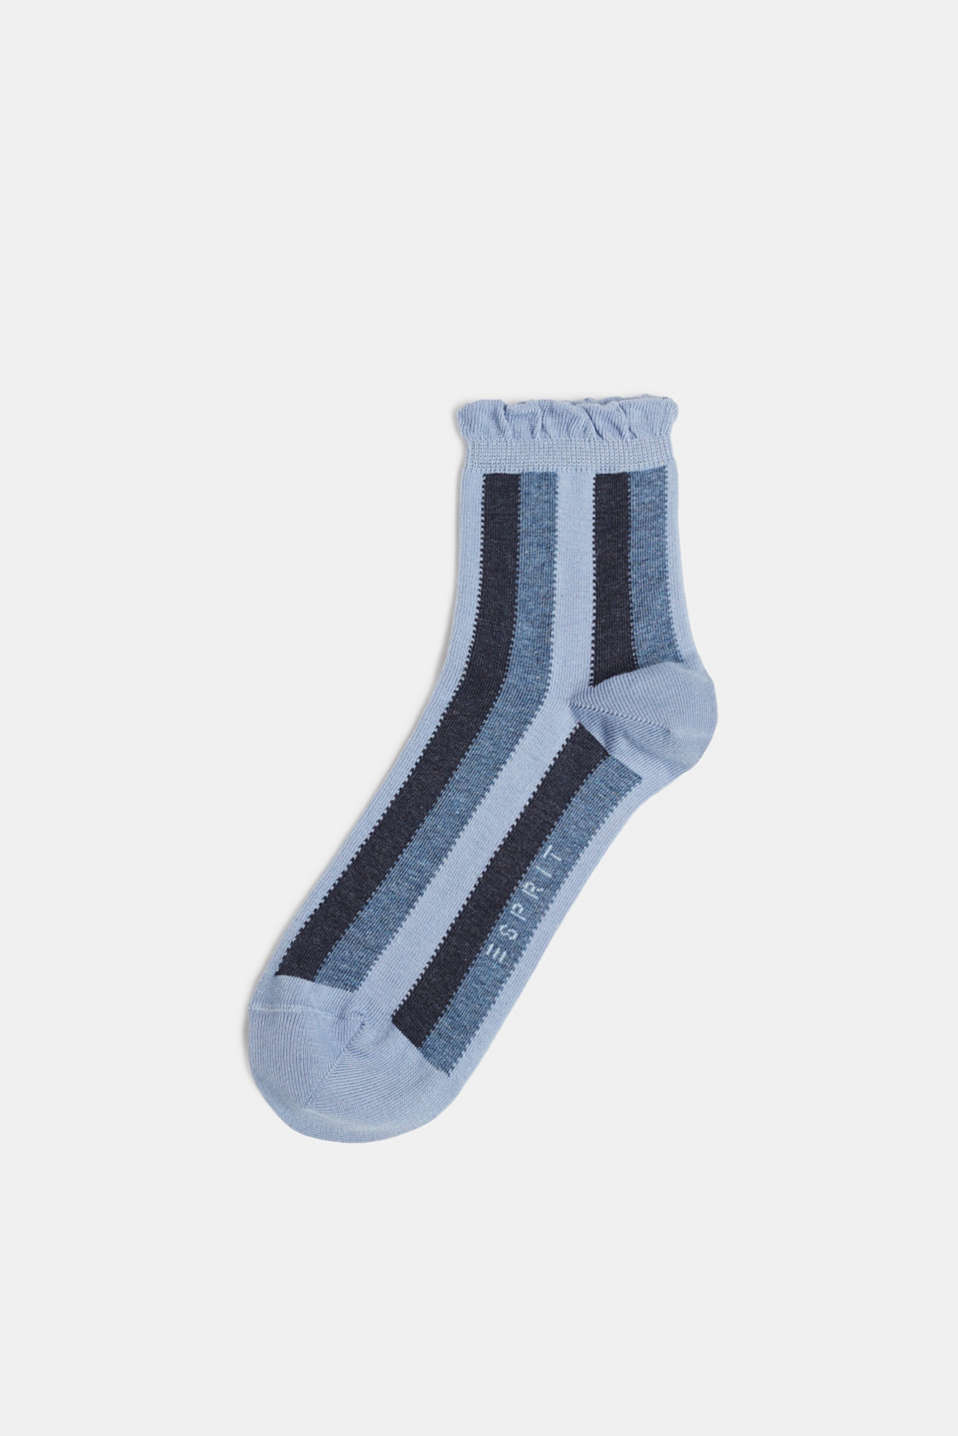 Socks with frilled edge, SUMMER SKY, detail image number 0